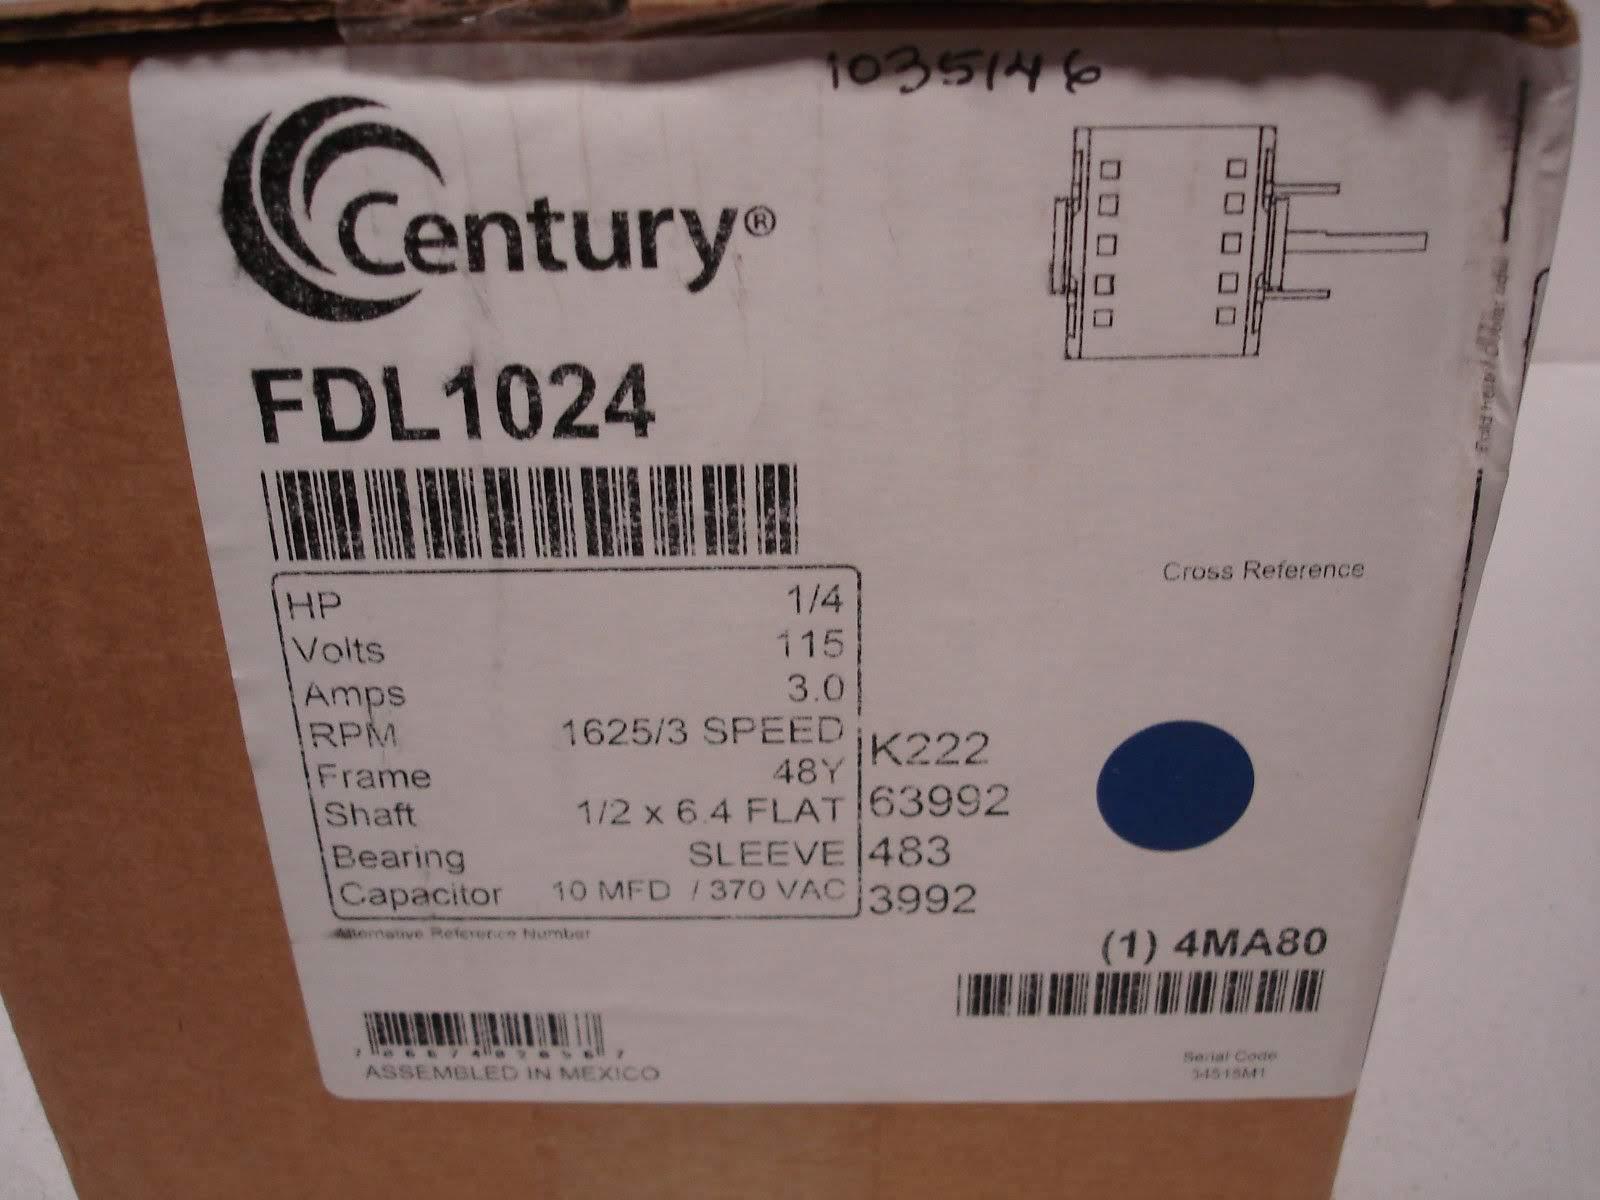 Lot 16 - (1) *NIB* CENTURY OYK1026 REPLACEMENT MOTOR HP1/4 VOLTS208-230 RPM1075 48Y *NIB*; (1) *NIB*